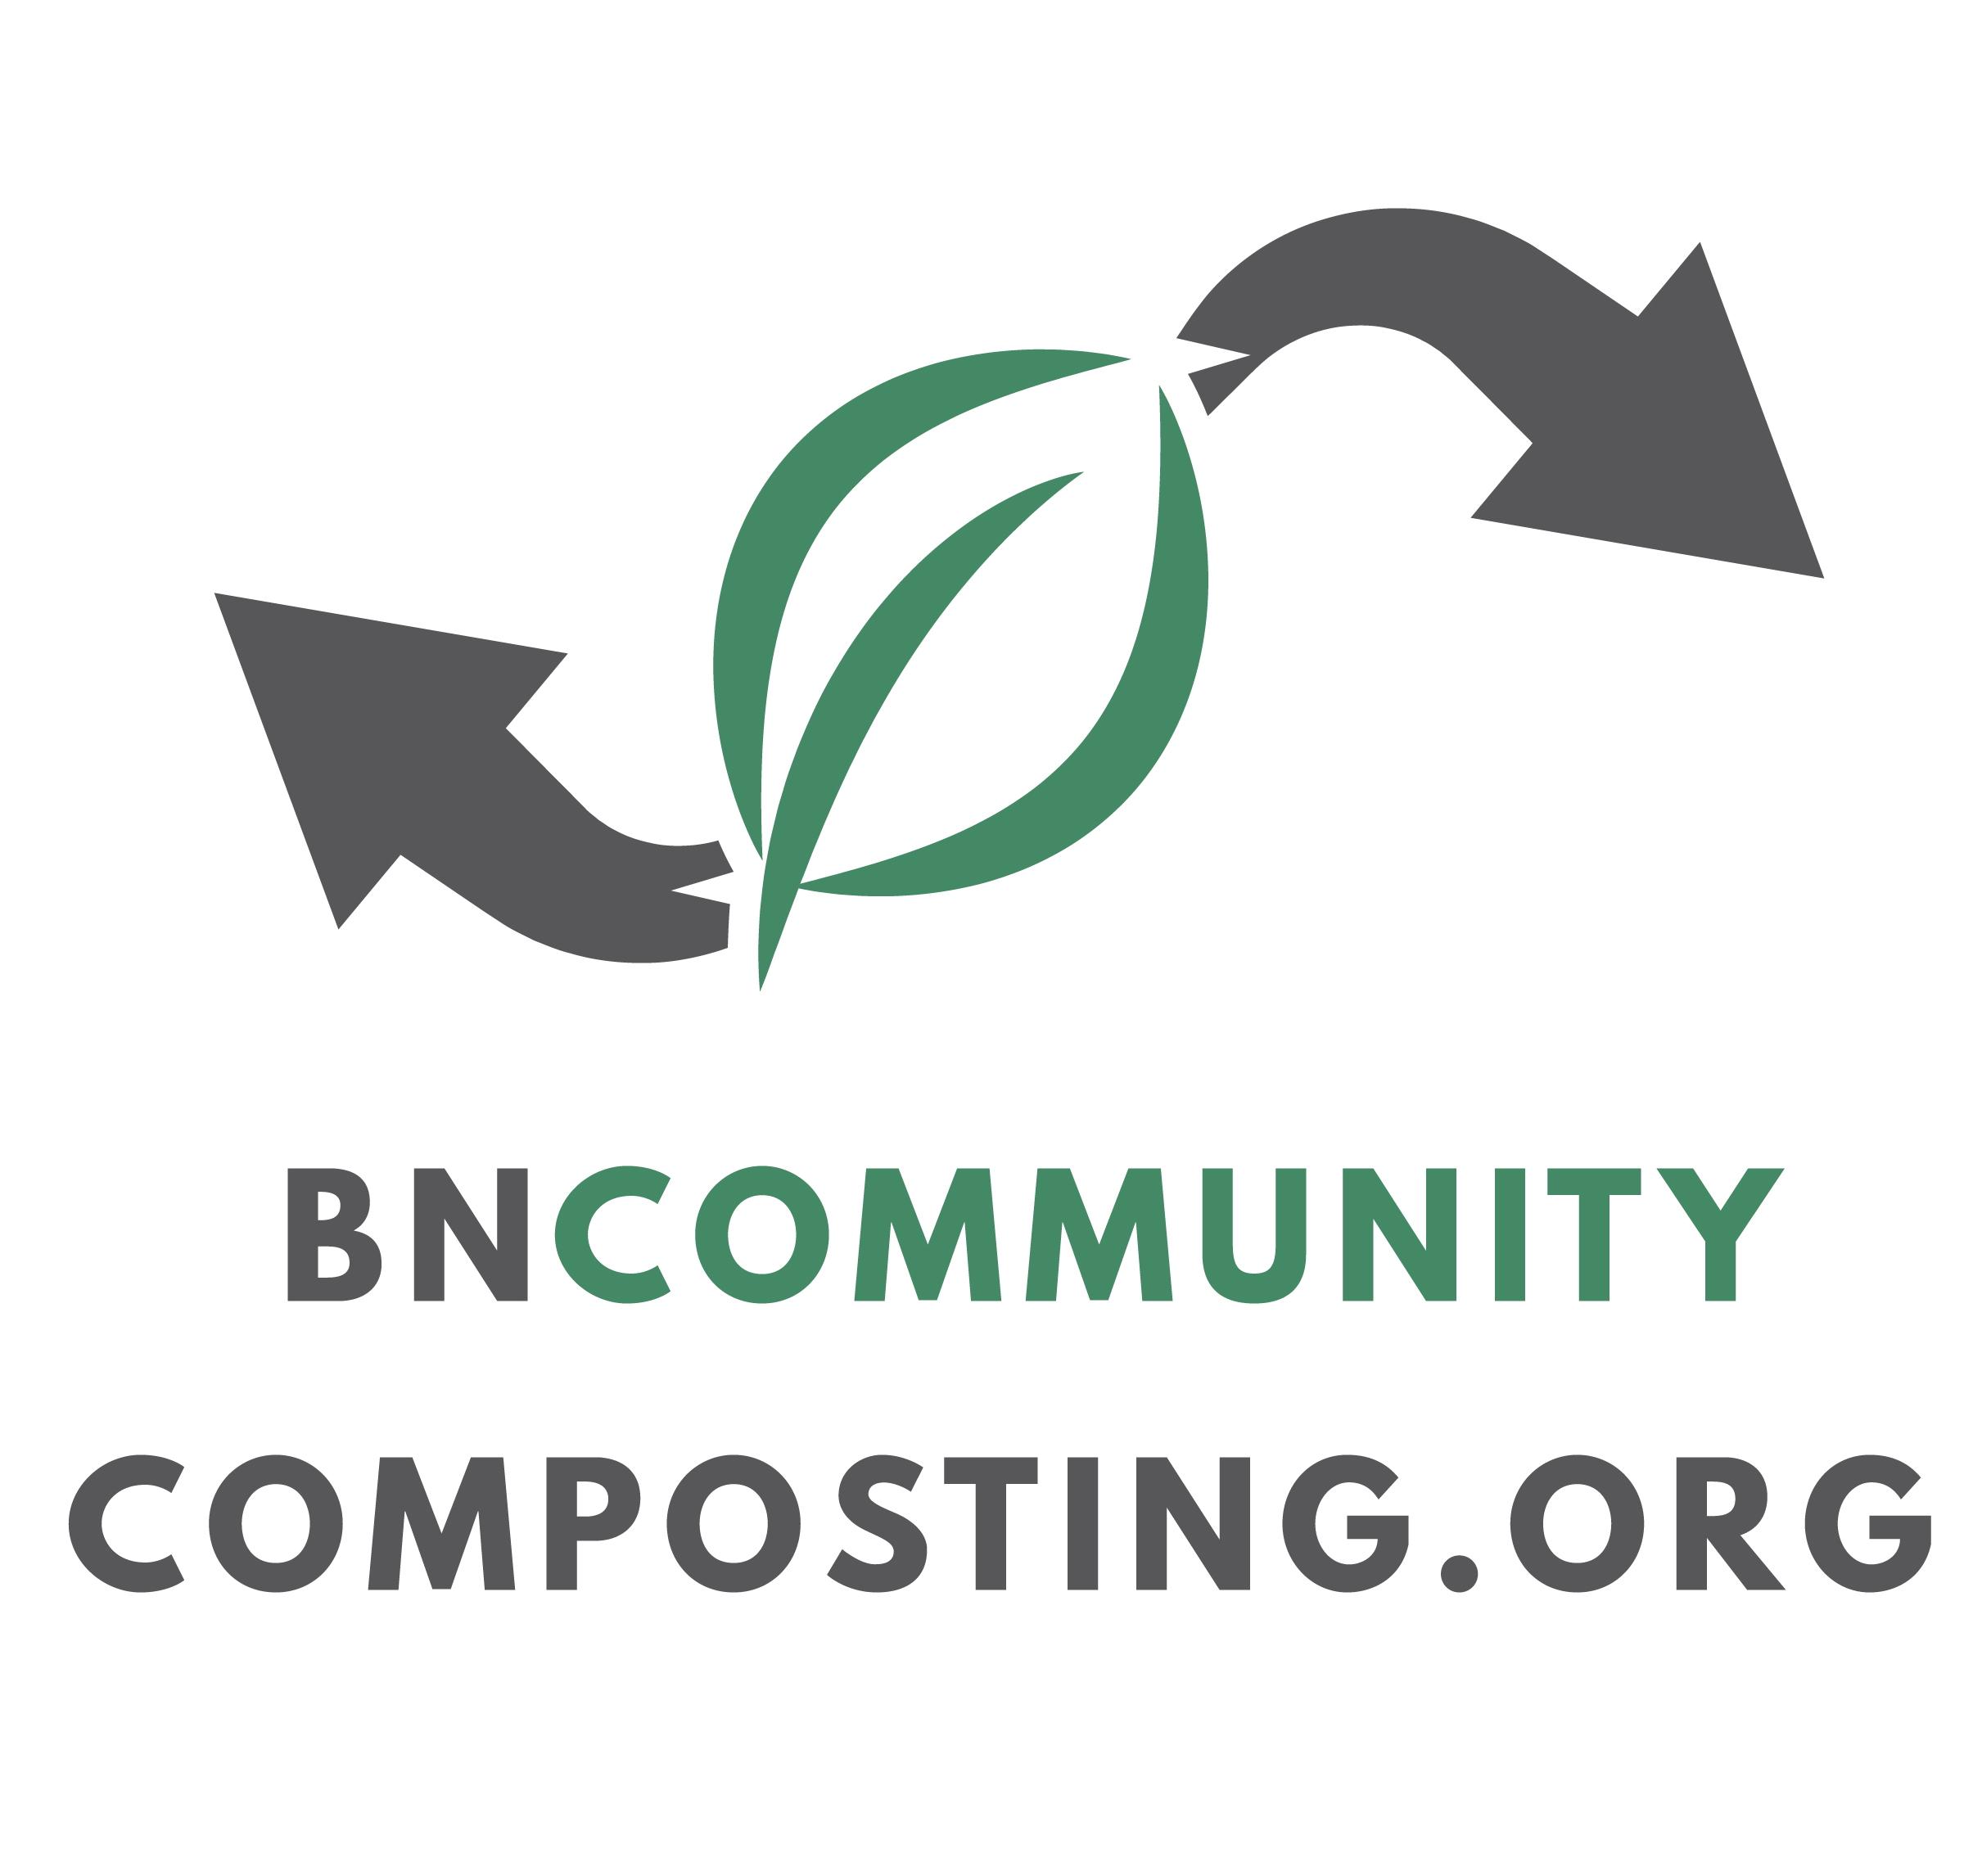 BN Community Composting